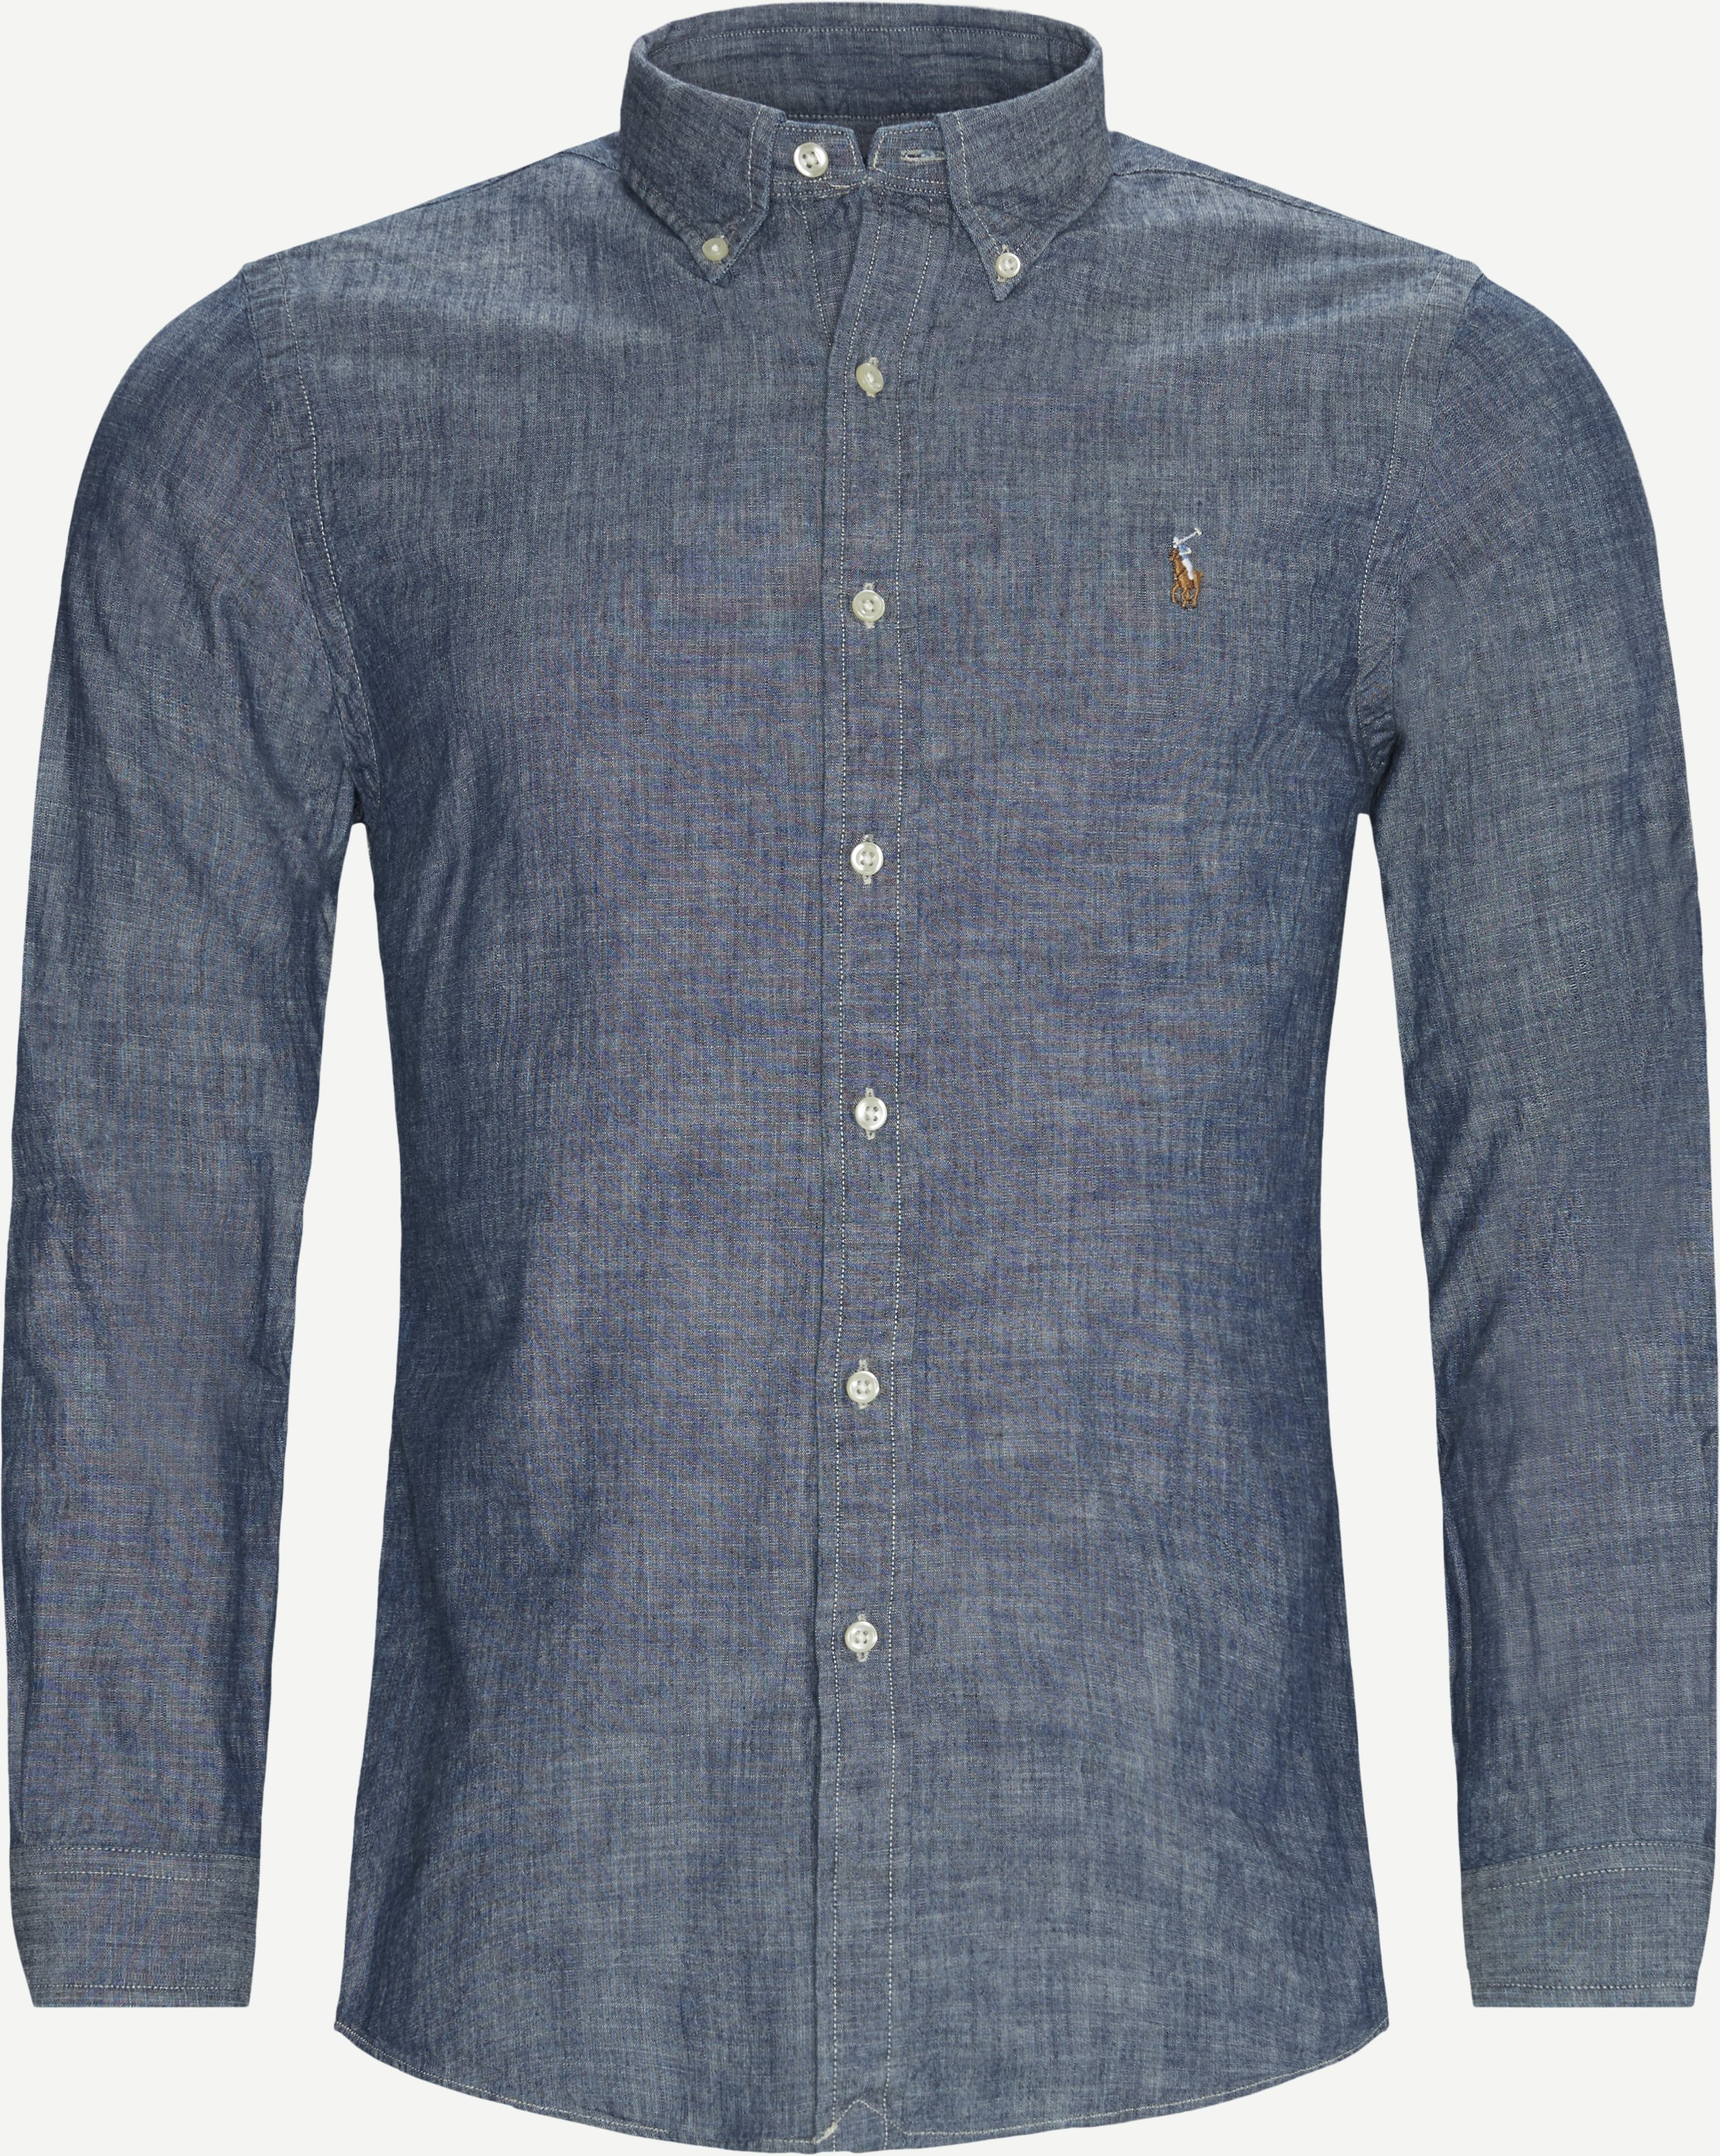 Hemden - Slim - Jeans-Blau